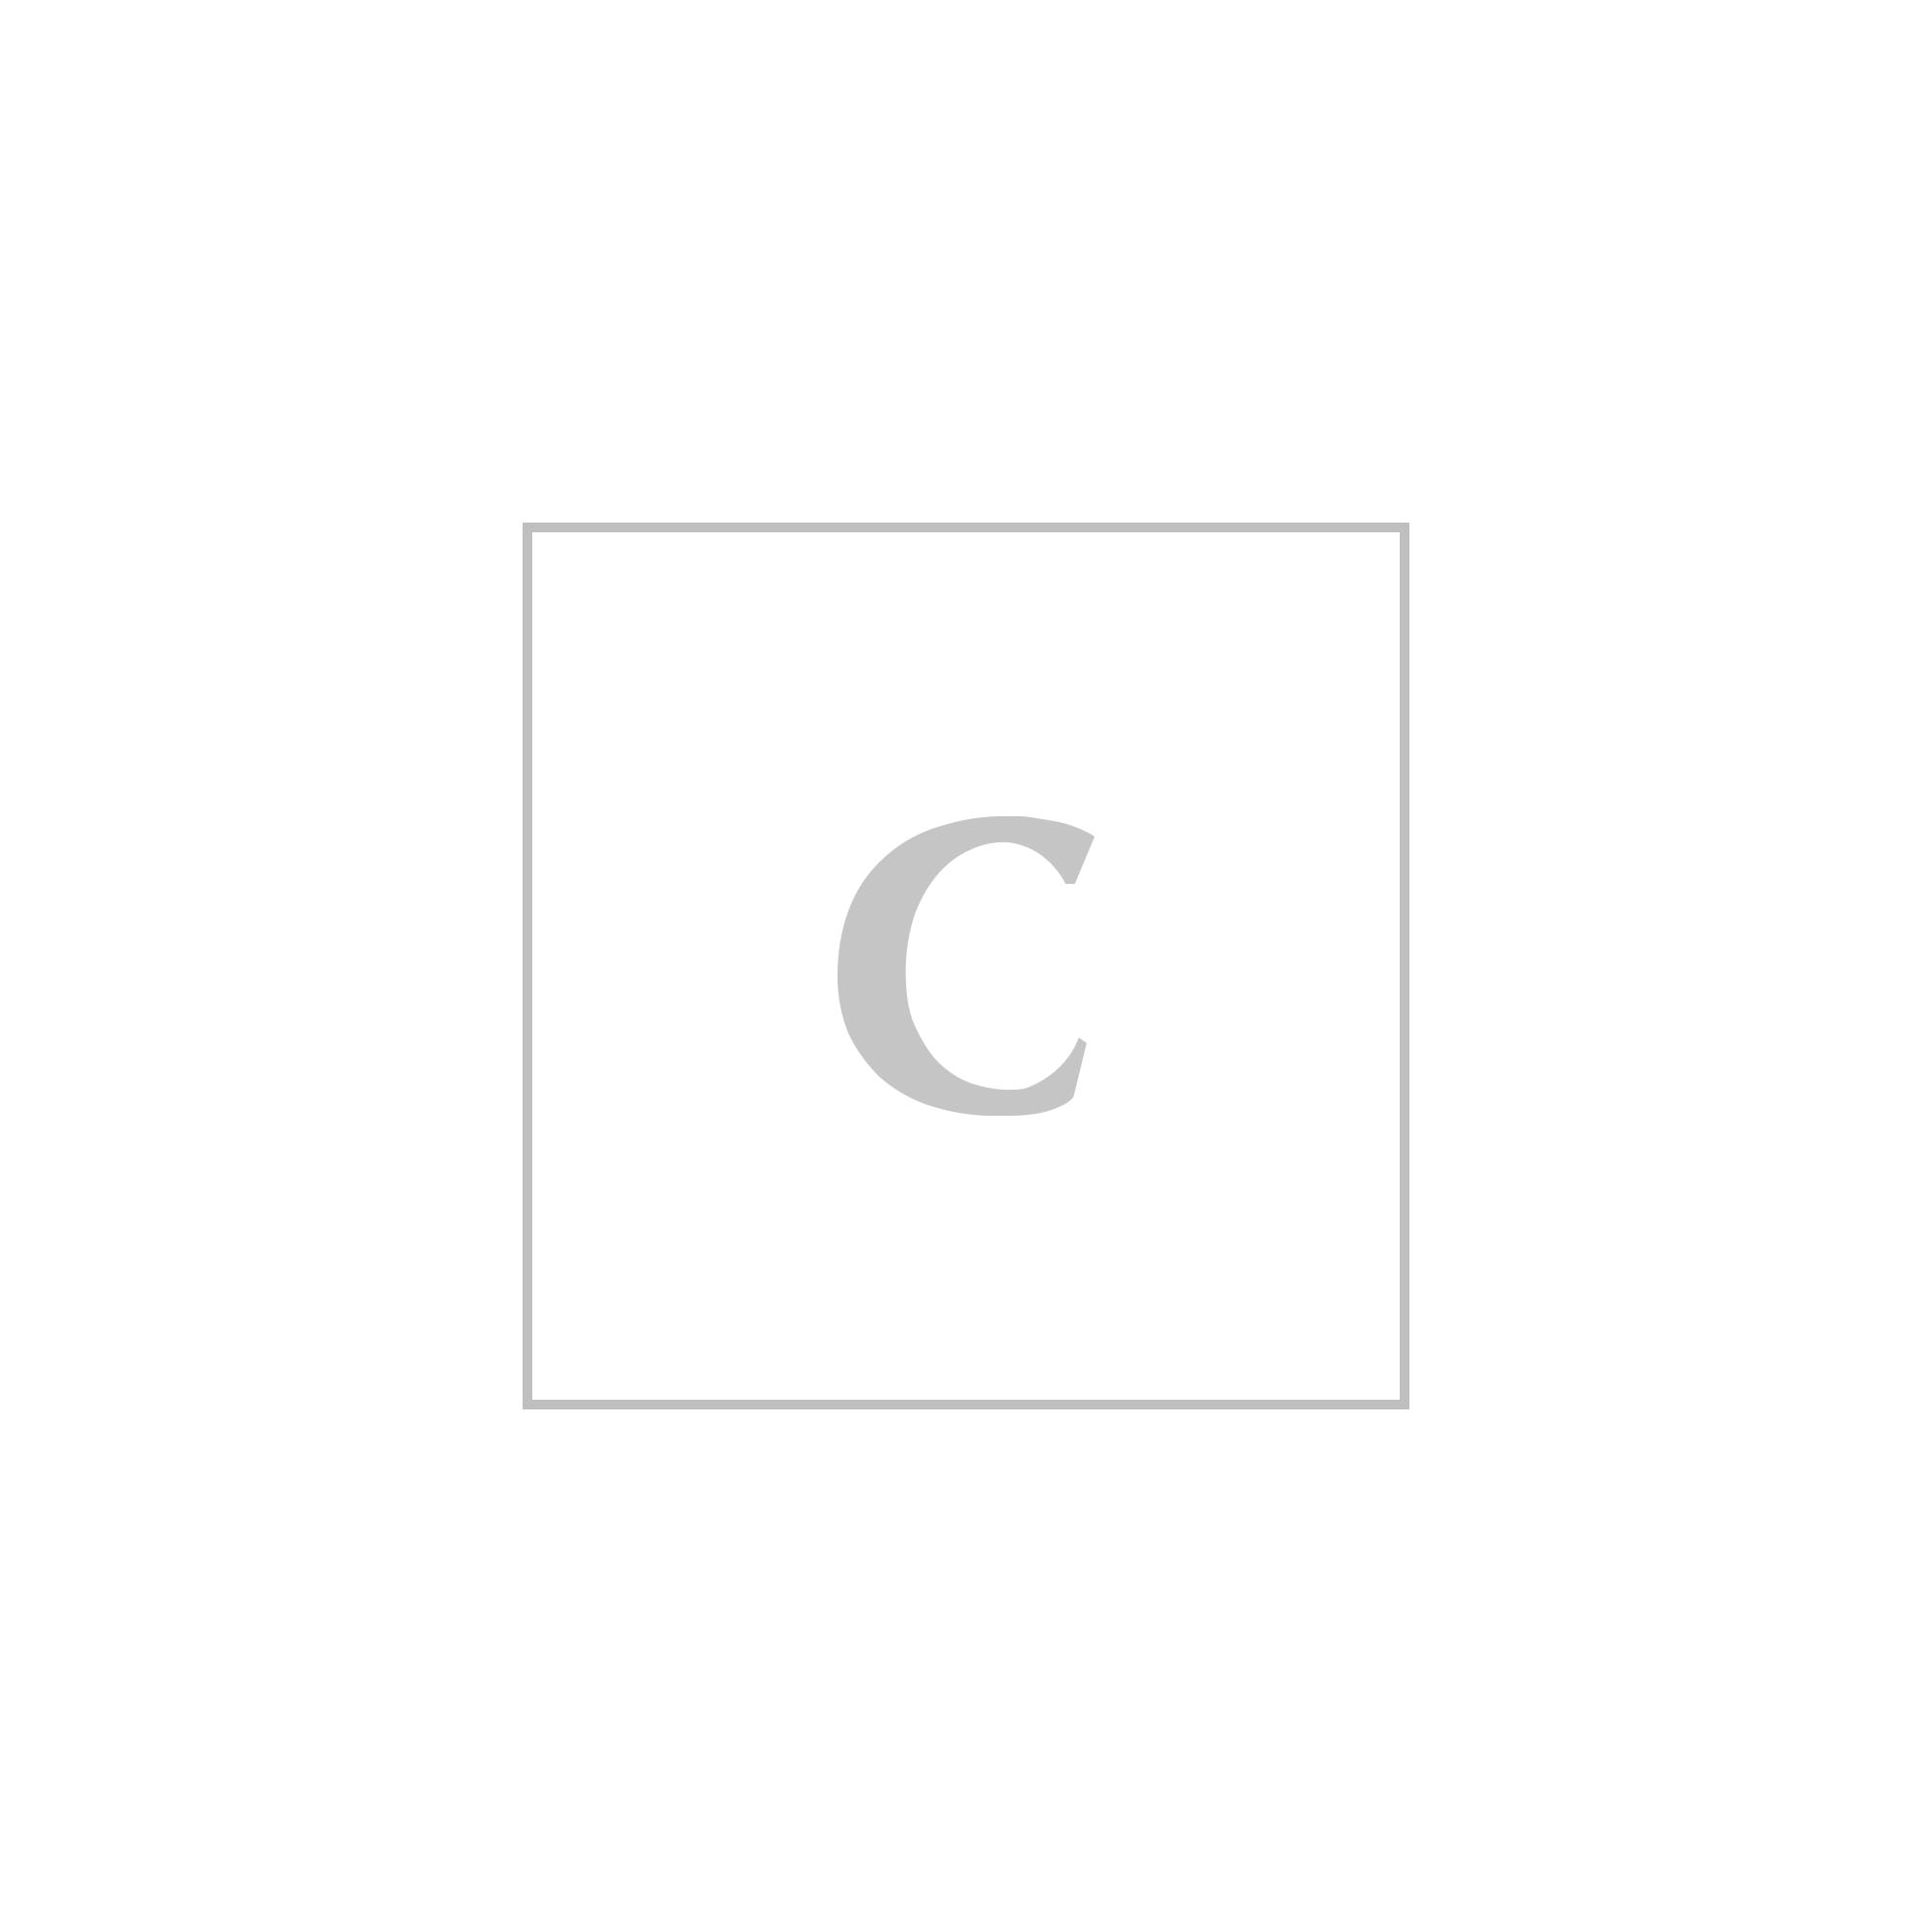 Stella mccartney borsa mini shoulder quilted shiny dotted chamois